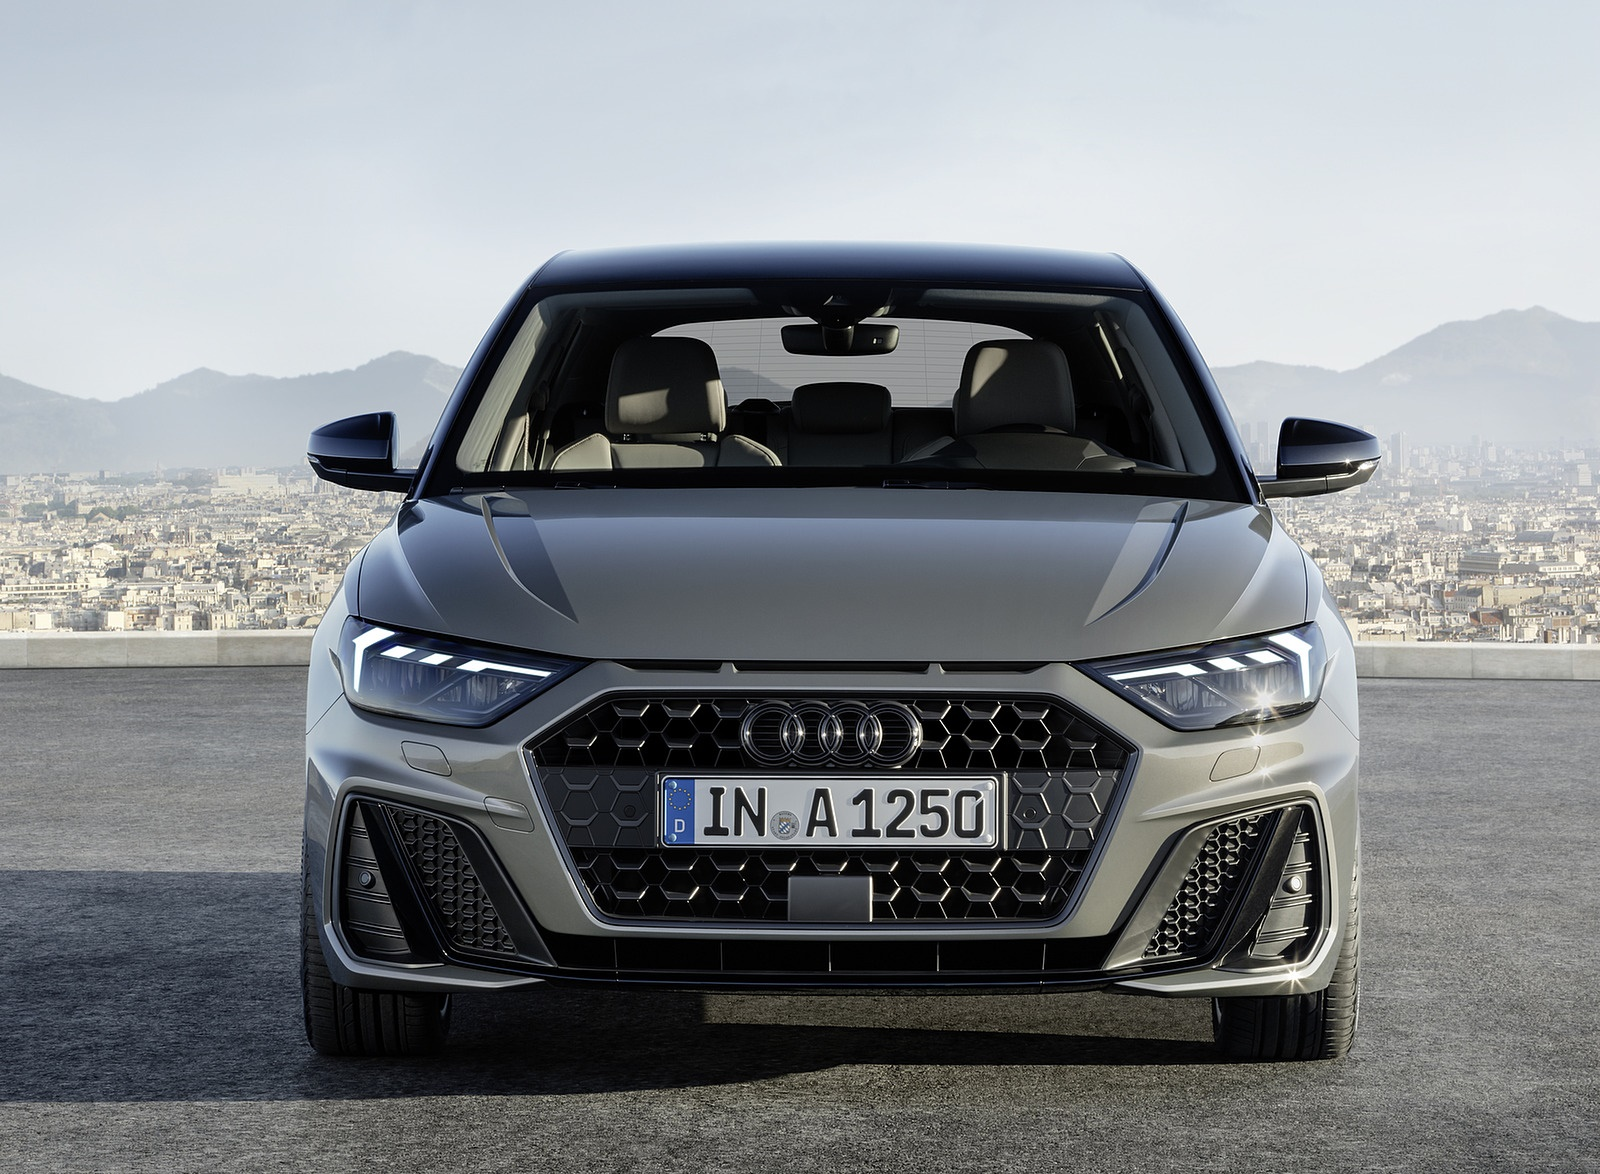 2019 Audi A1 Sportback (Color: Chronos Grey) Front Wallpapers (2)